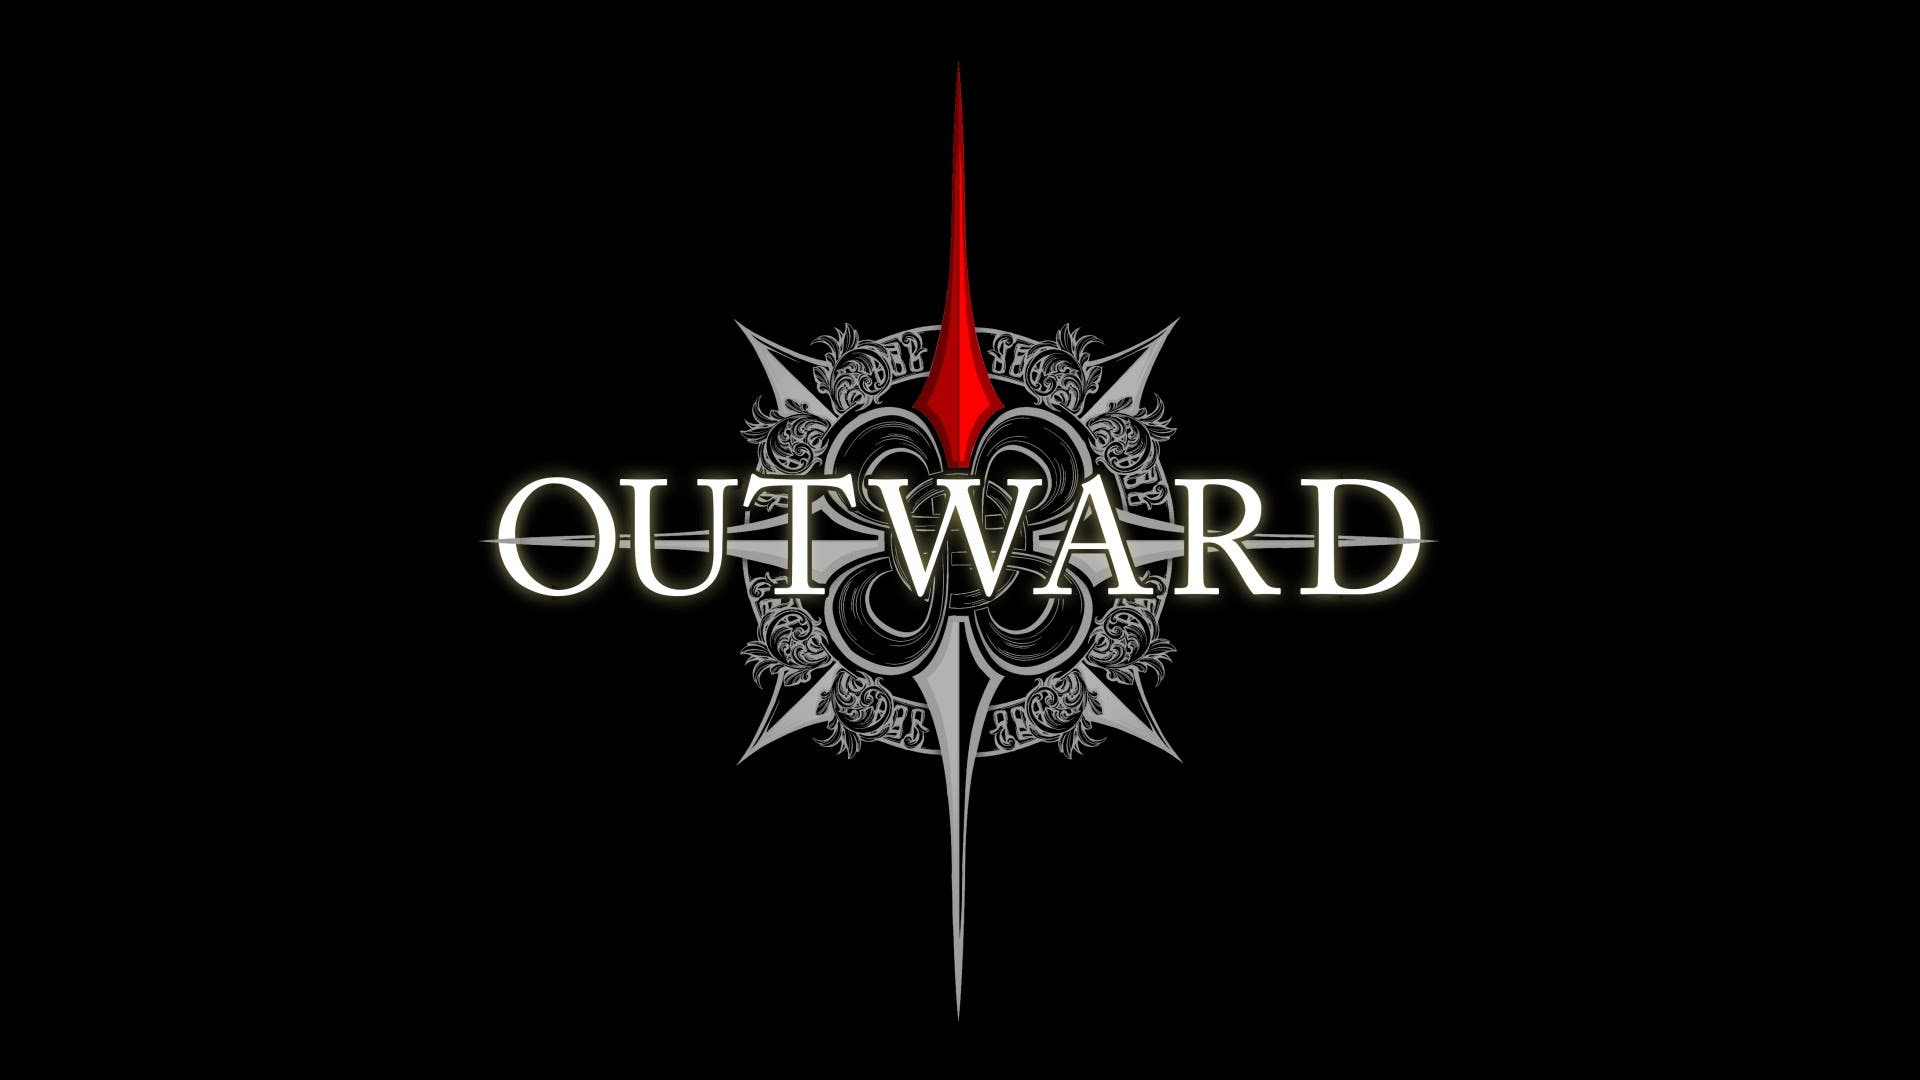 outward gameplay trailer release